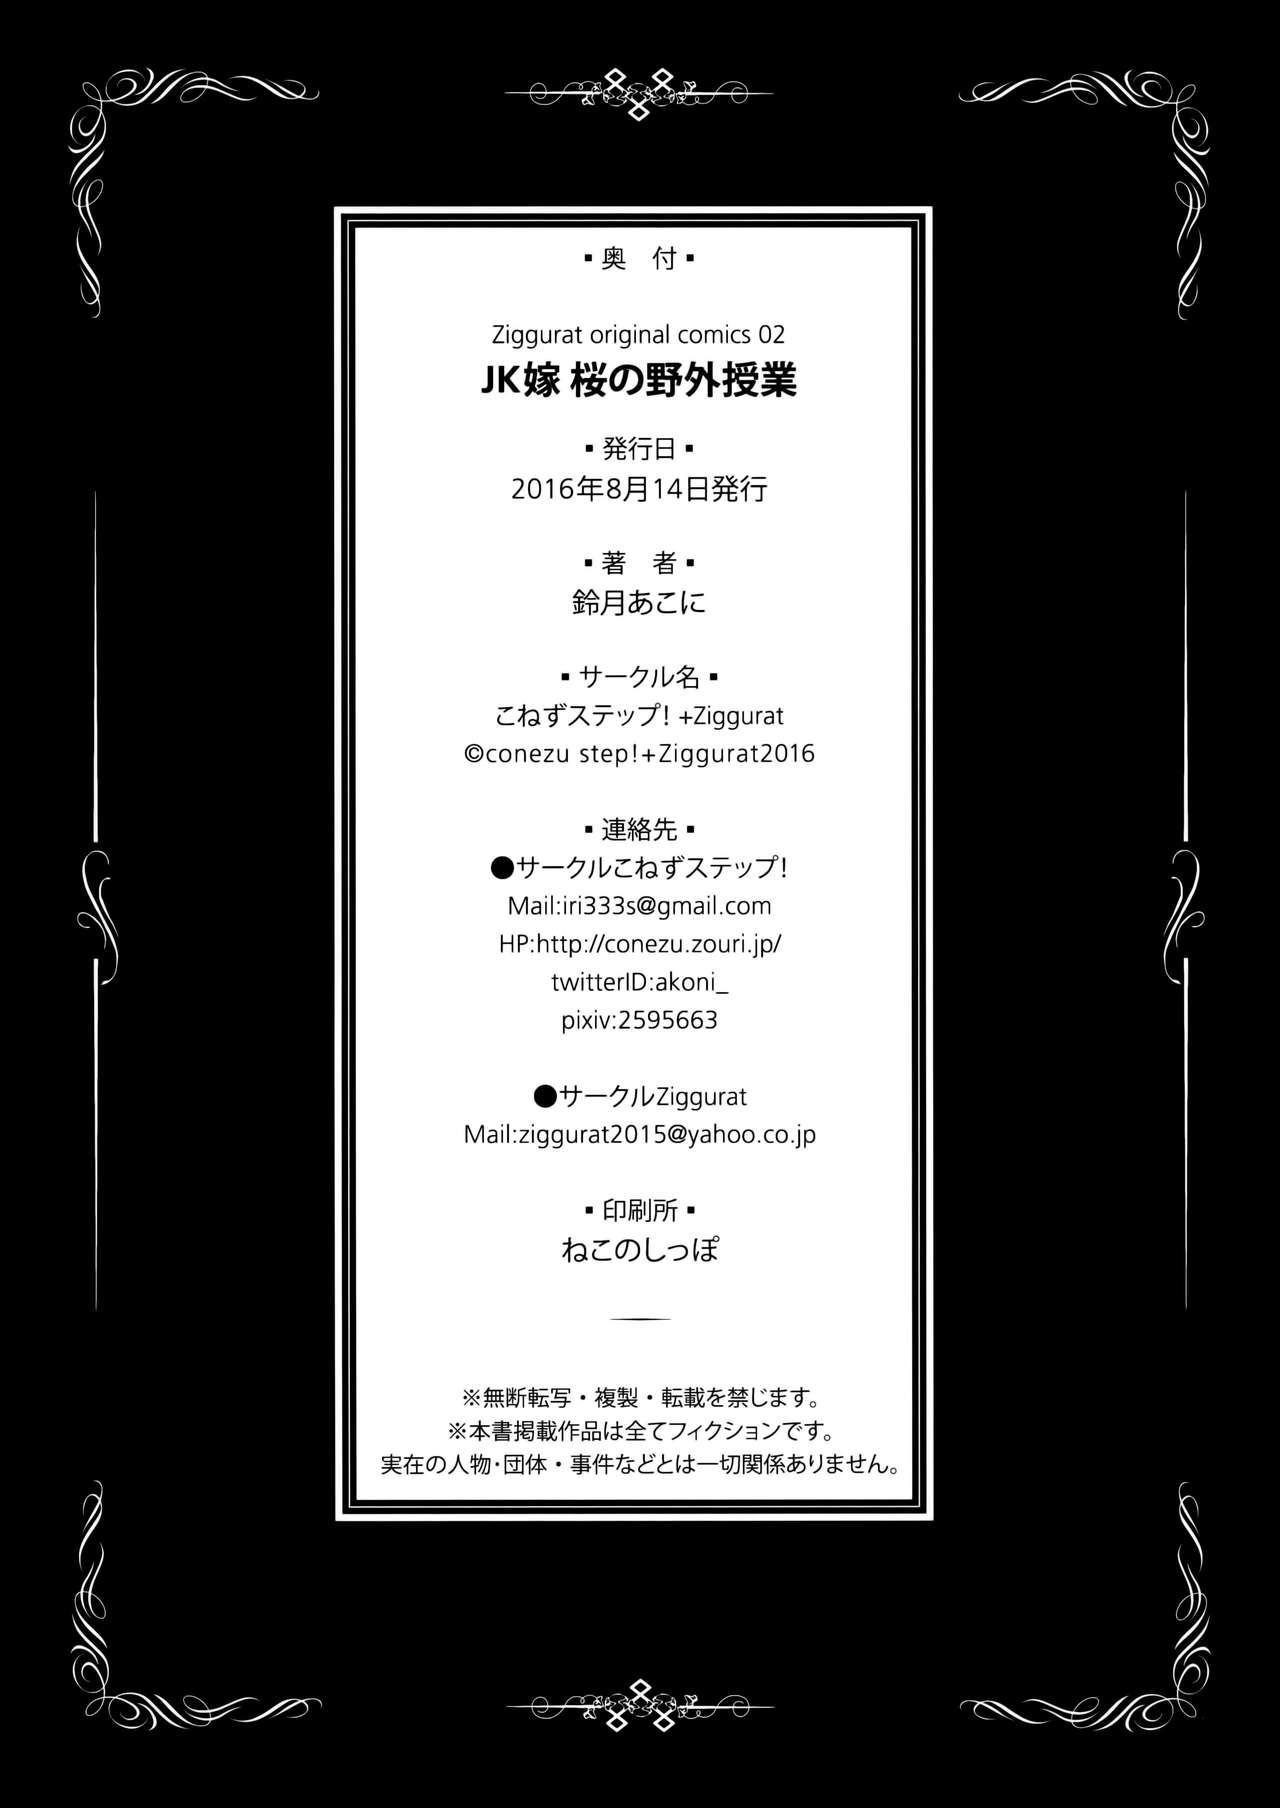 JK Yome Sakura no Yagai Jugyou 24